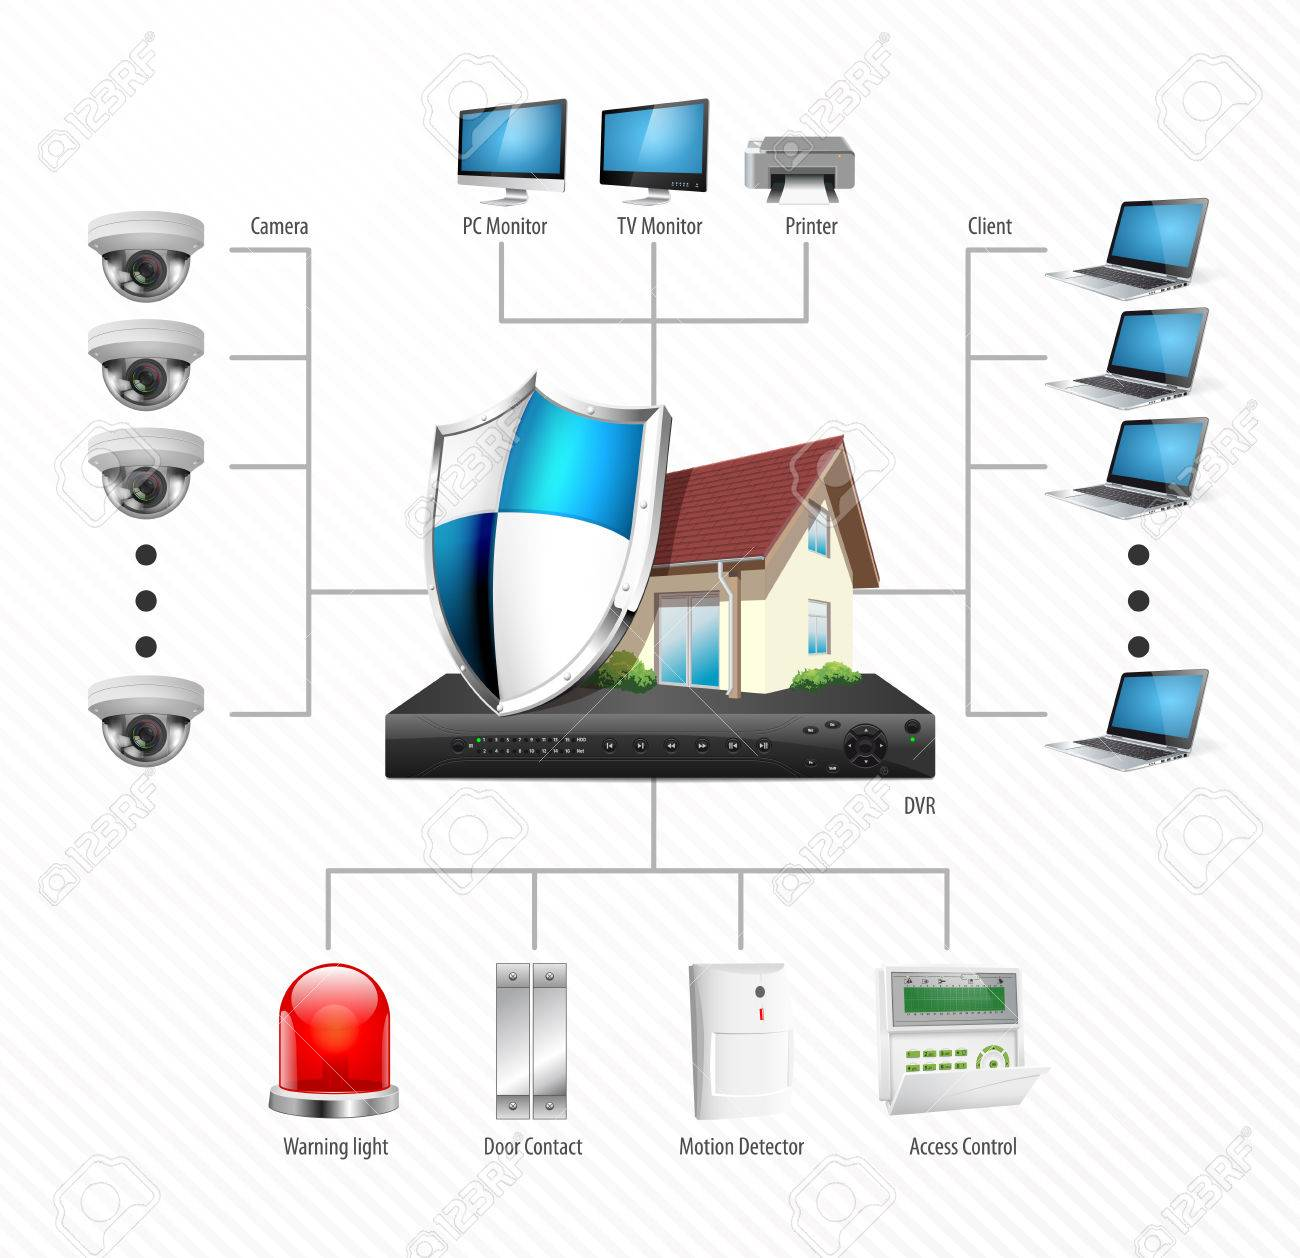 Surveillance Camera Diagram Schematic Diagrams Wiring Cctv Installation Ip Home Security Ptz